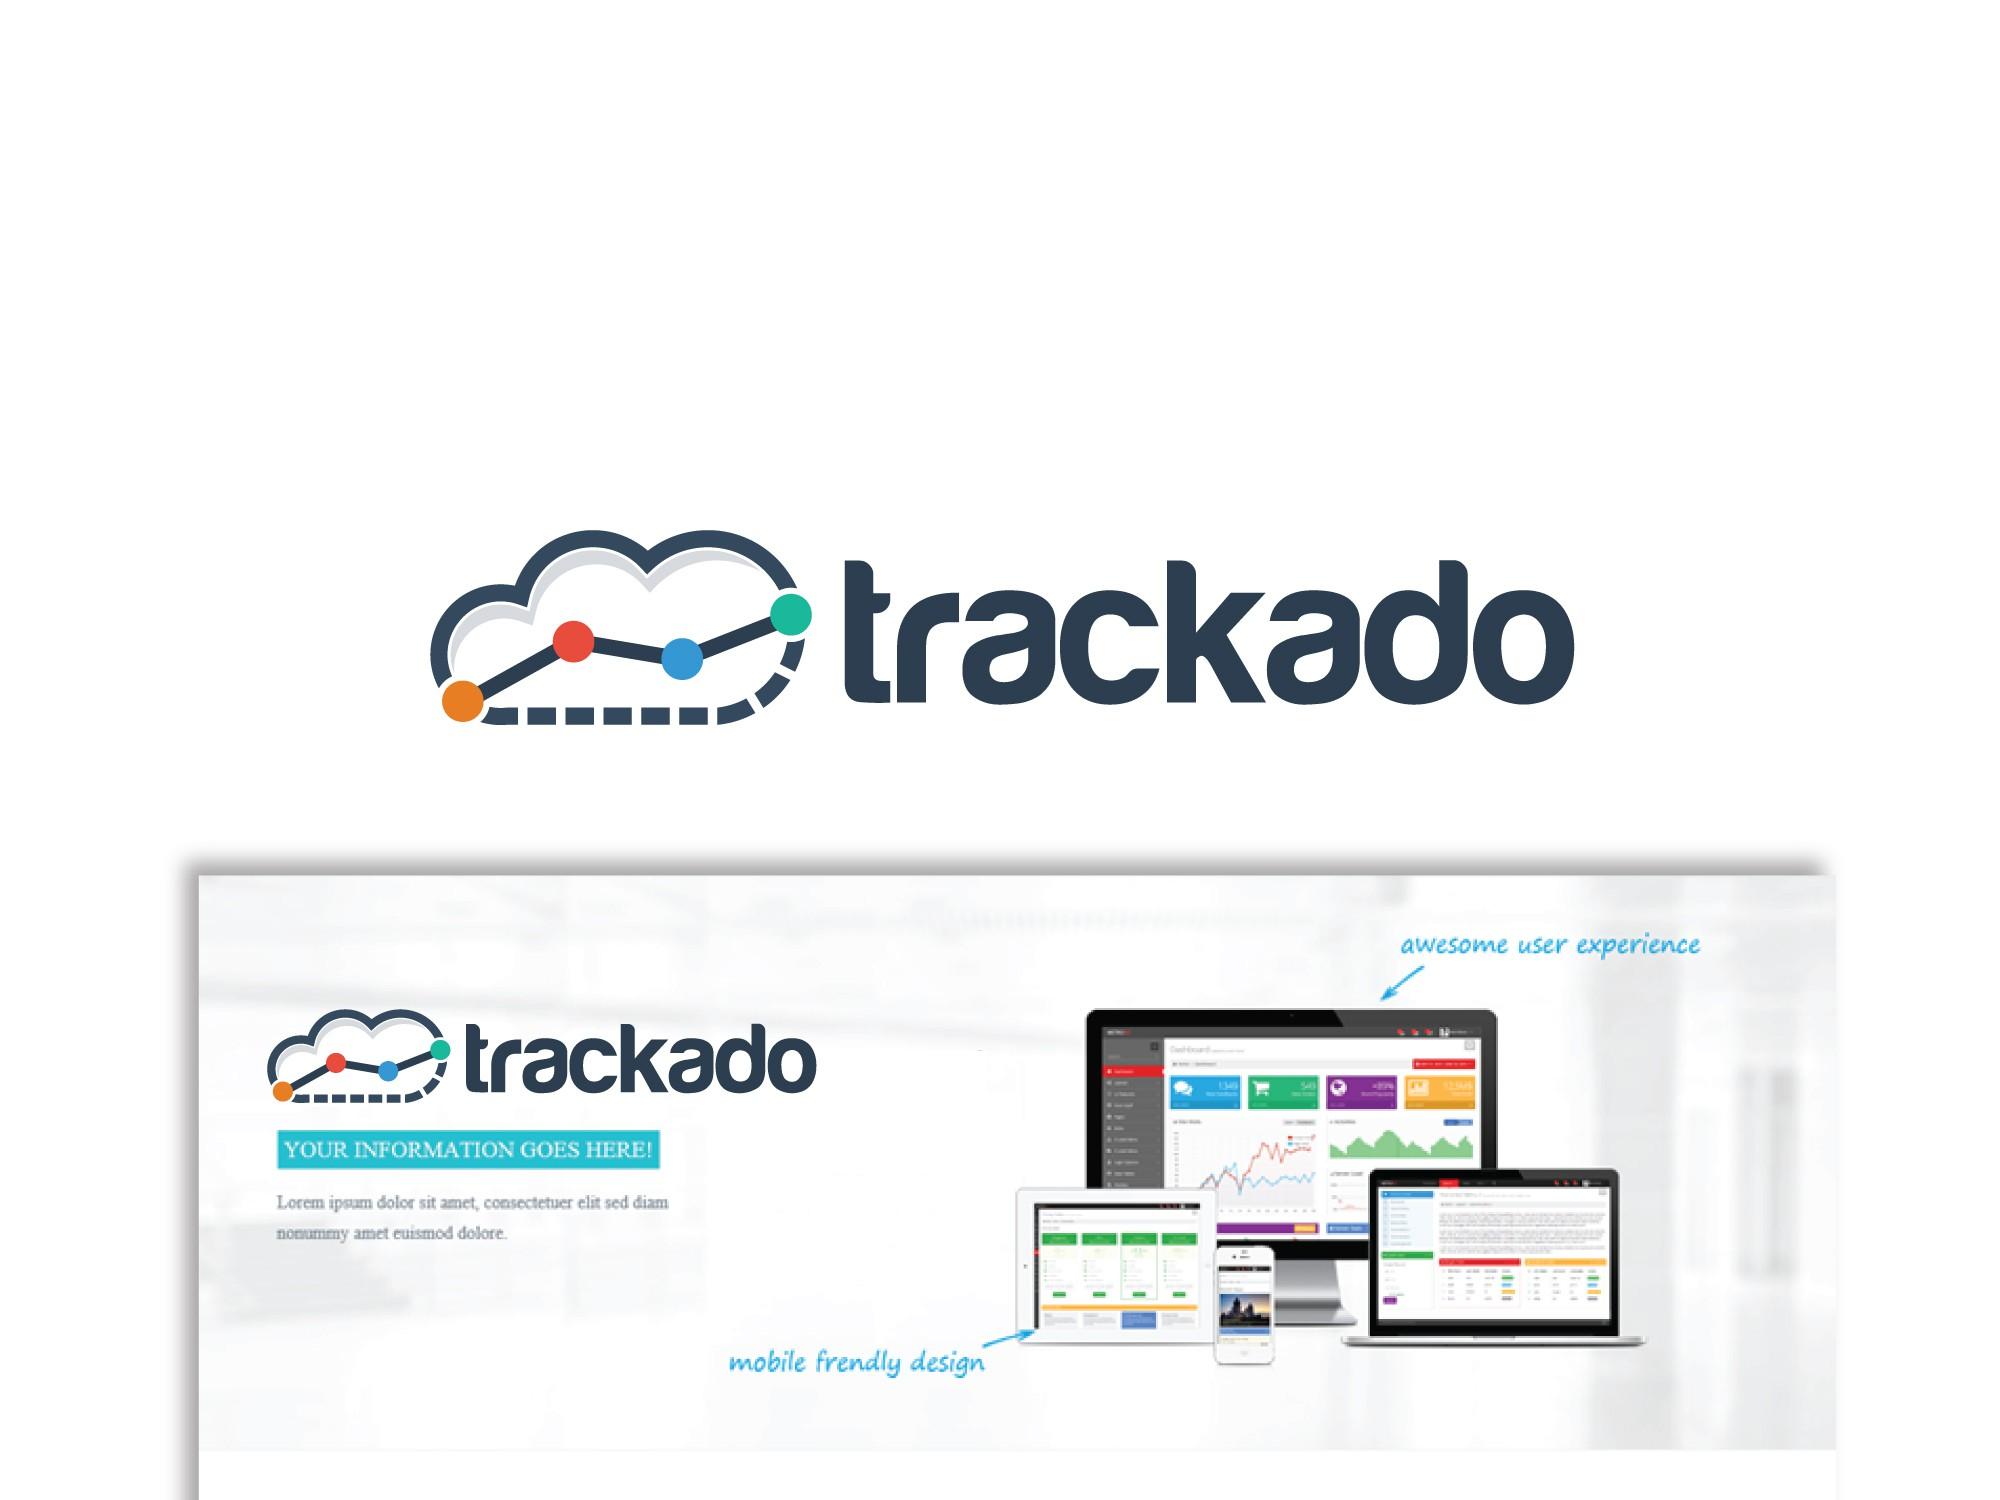 Create a winning logo for Trackado